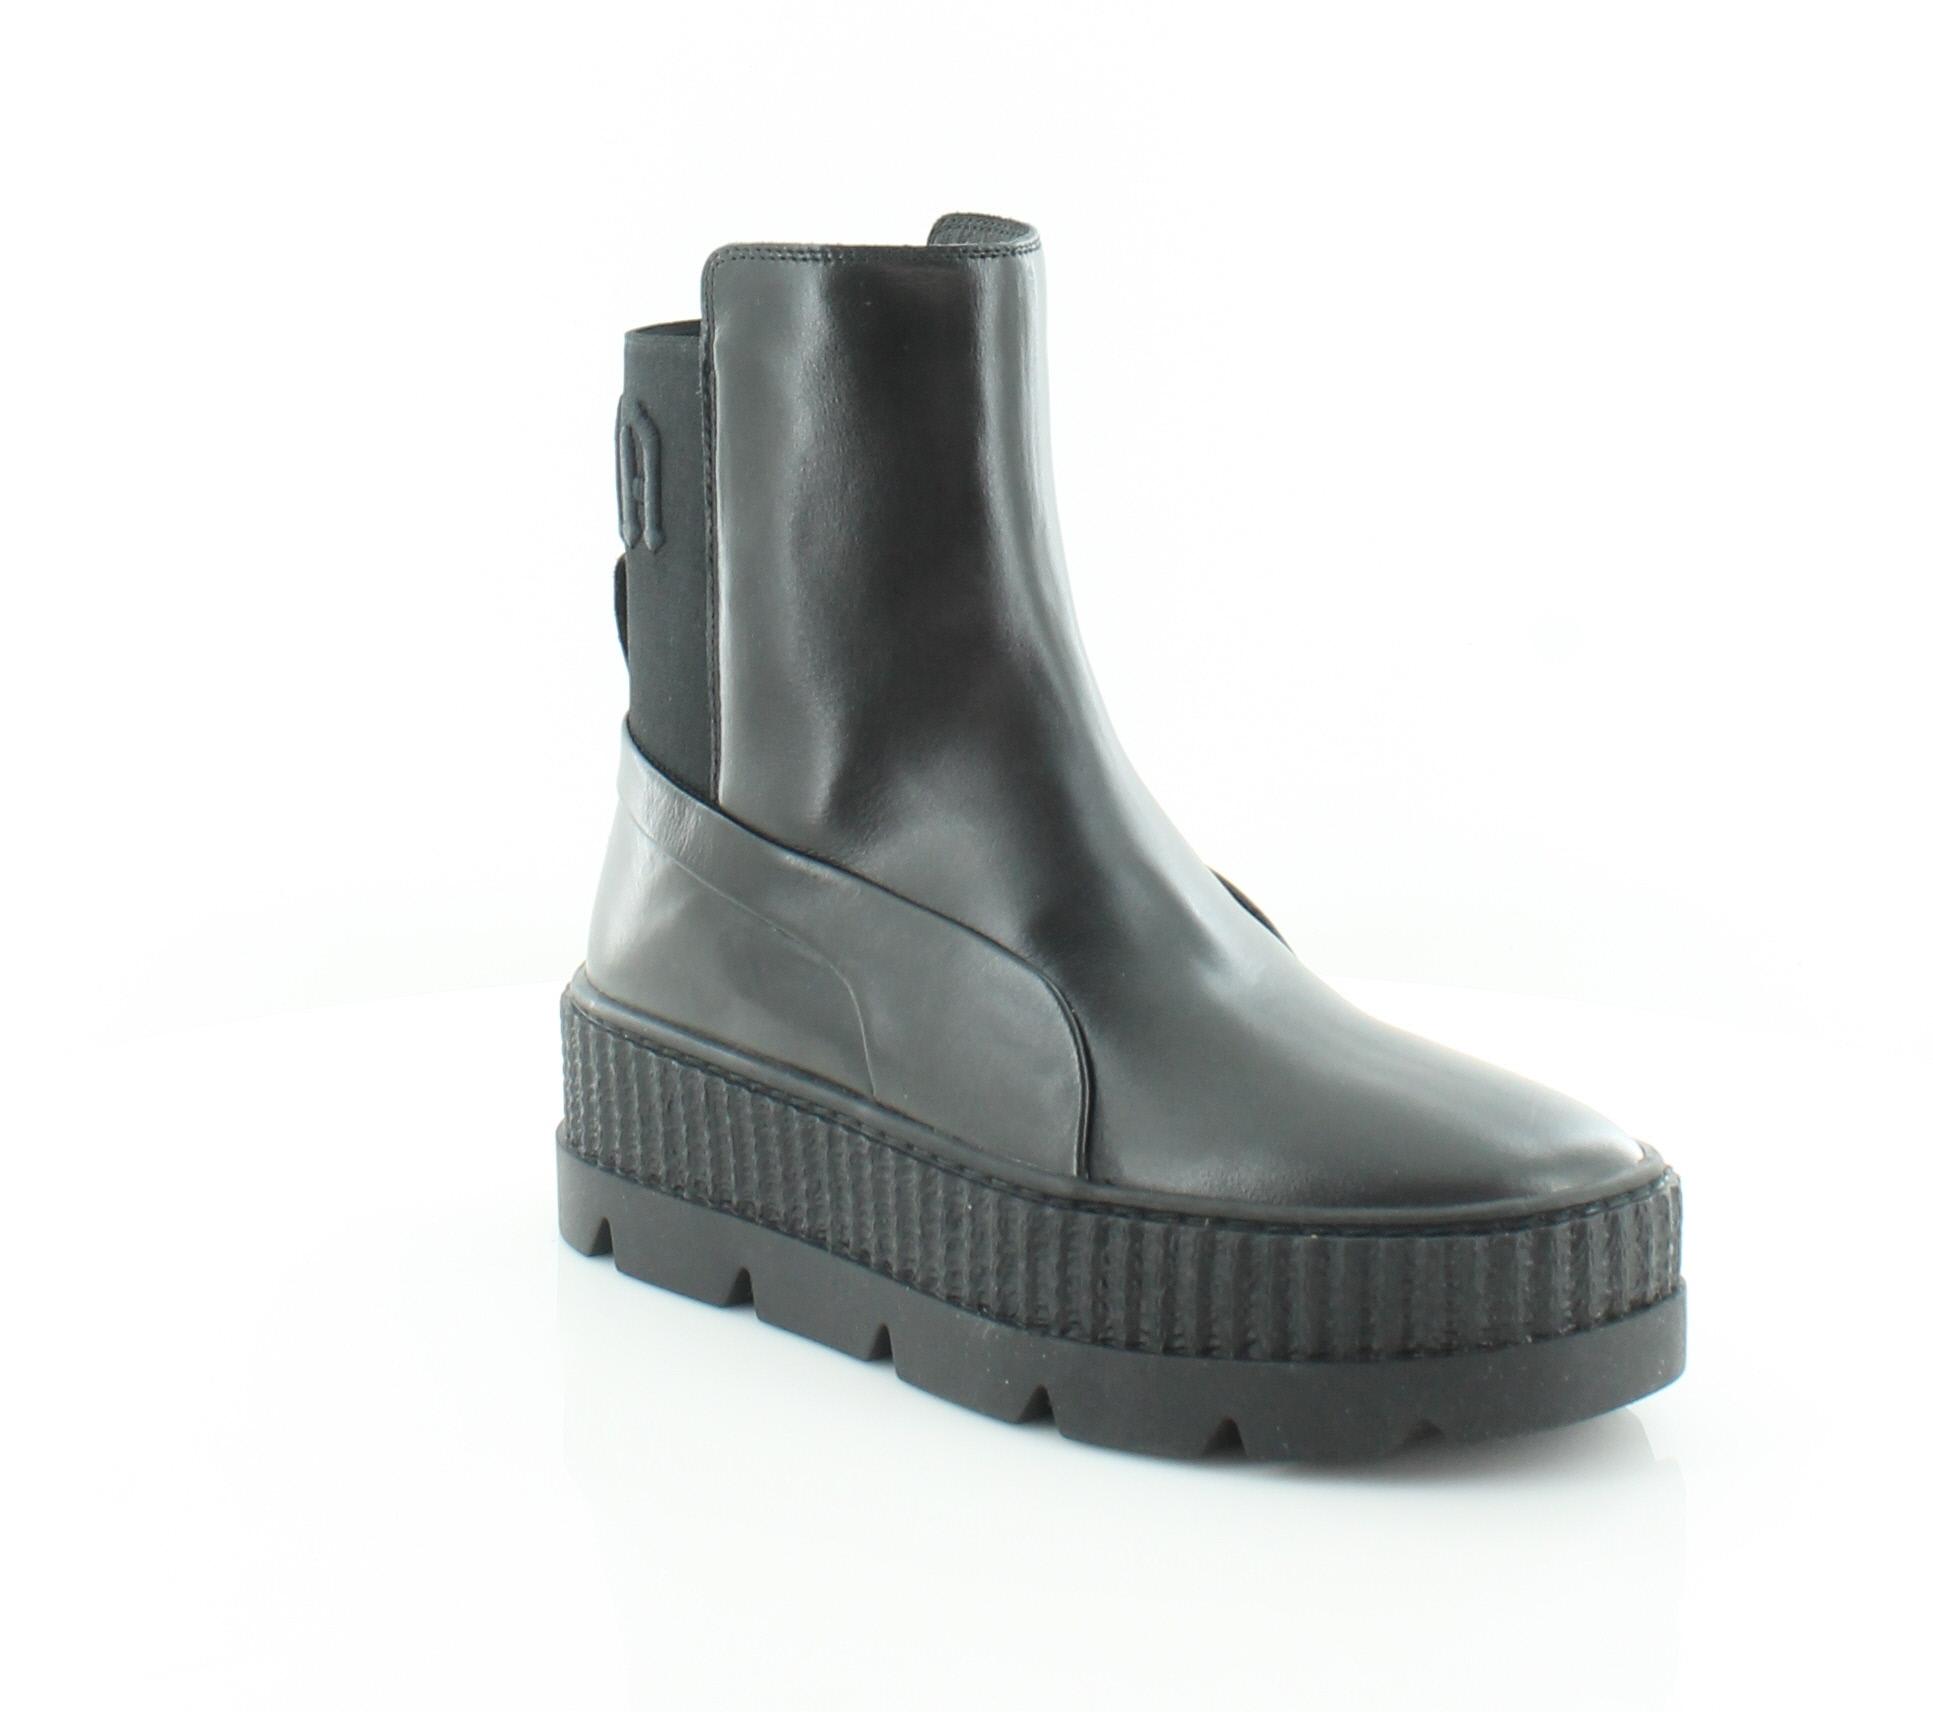 super cute c0f51 ec41a Details about Fenty Puma x Rihanna Chelsea Sneaker Black Womens Shoes 7 M  Boots MSRP $220